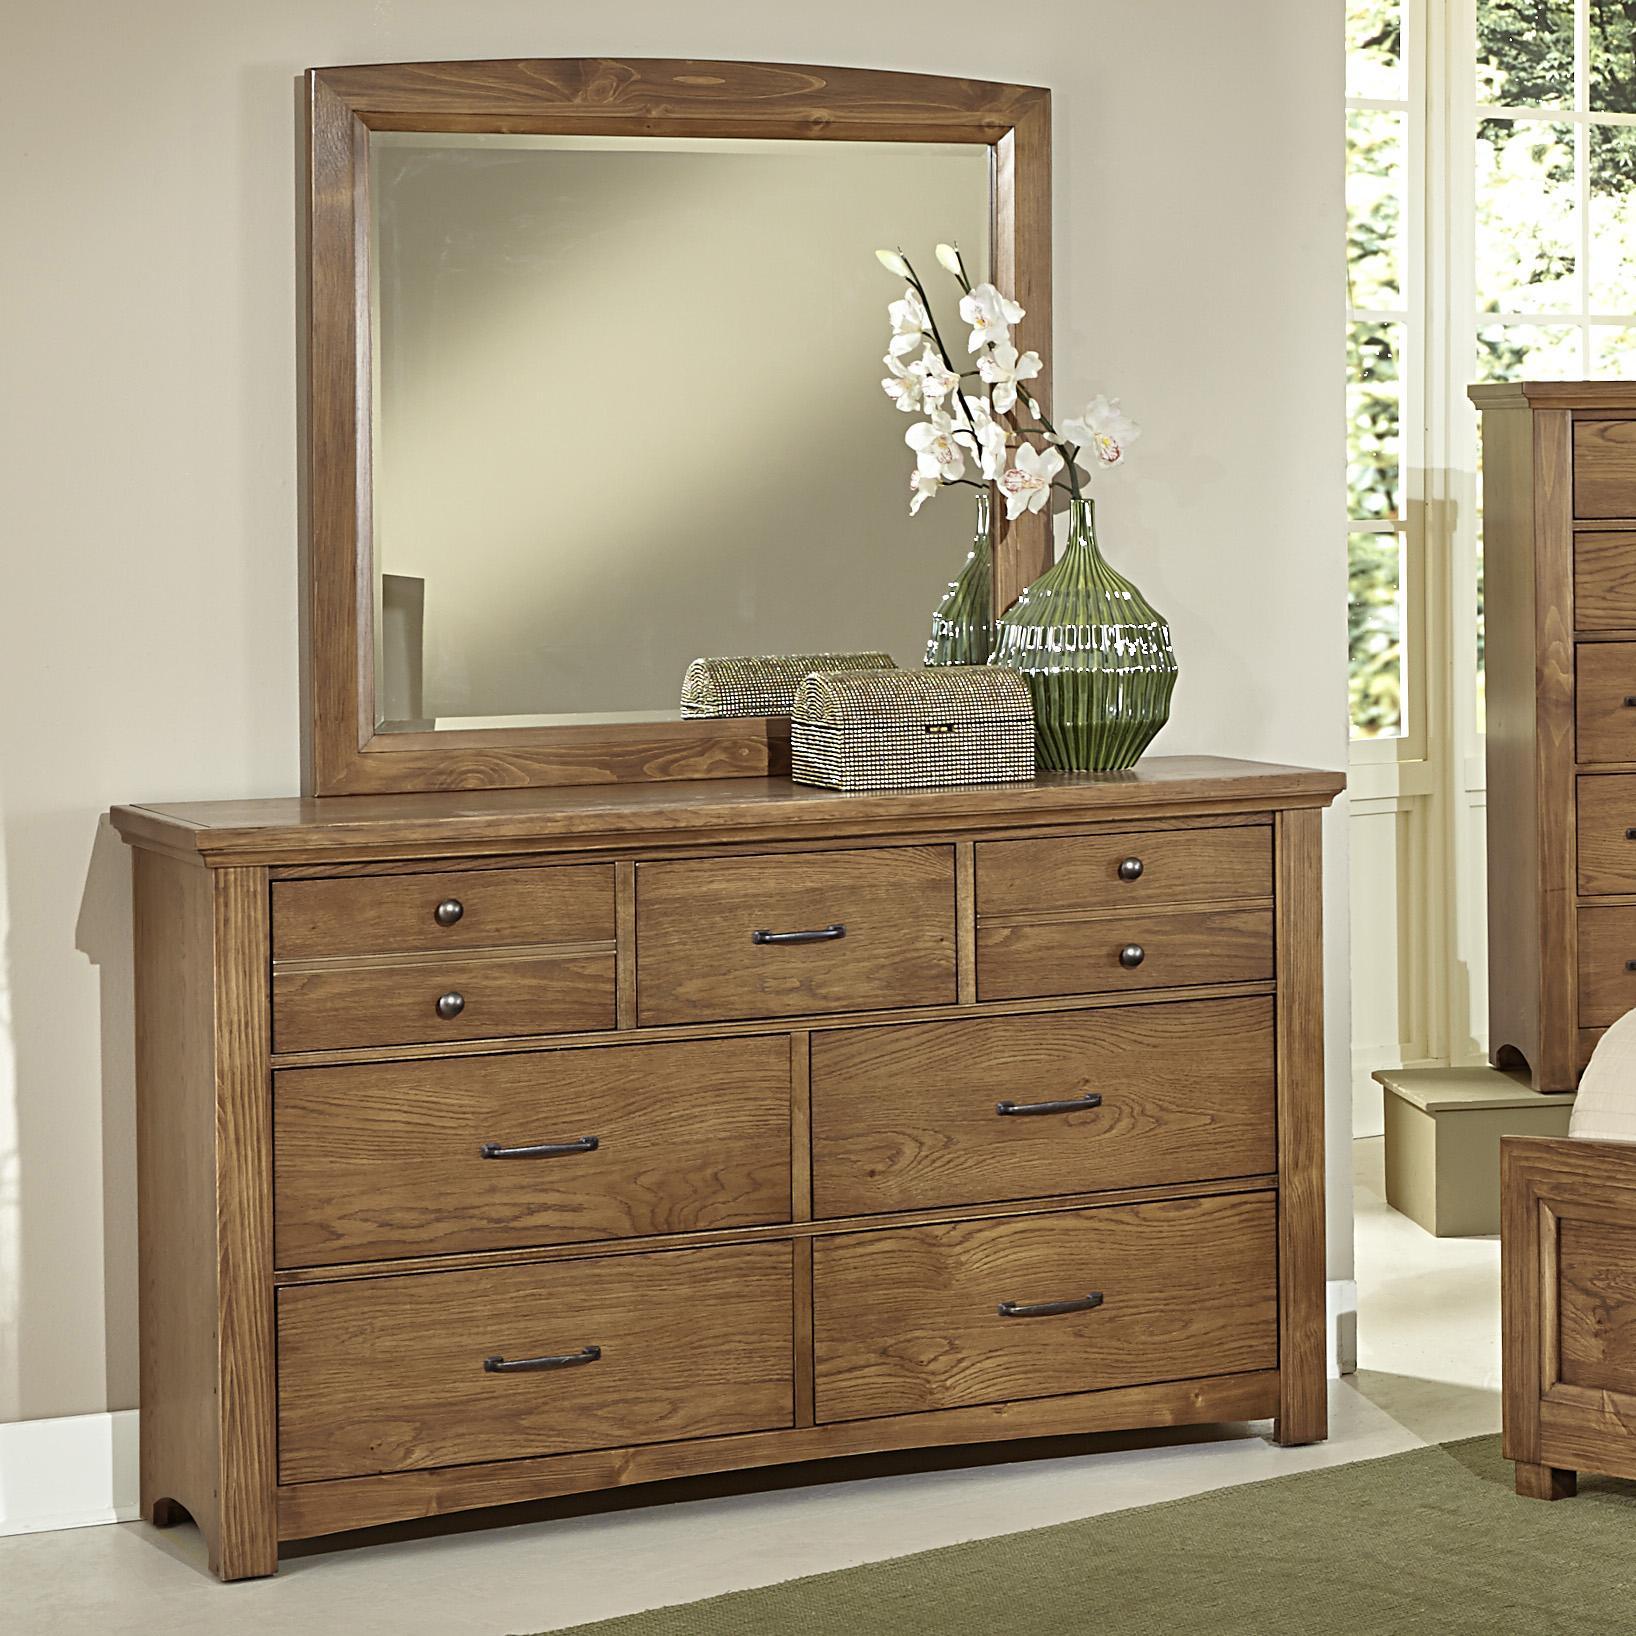 Vaughan Bassett Transitions Dresser & Landscape Mirror ...